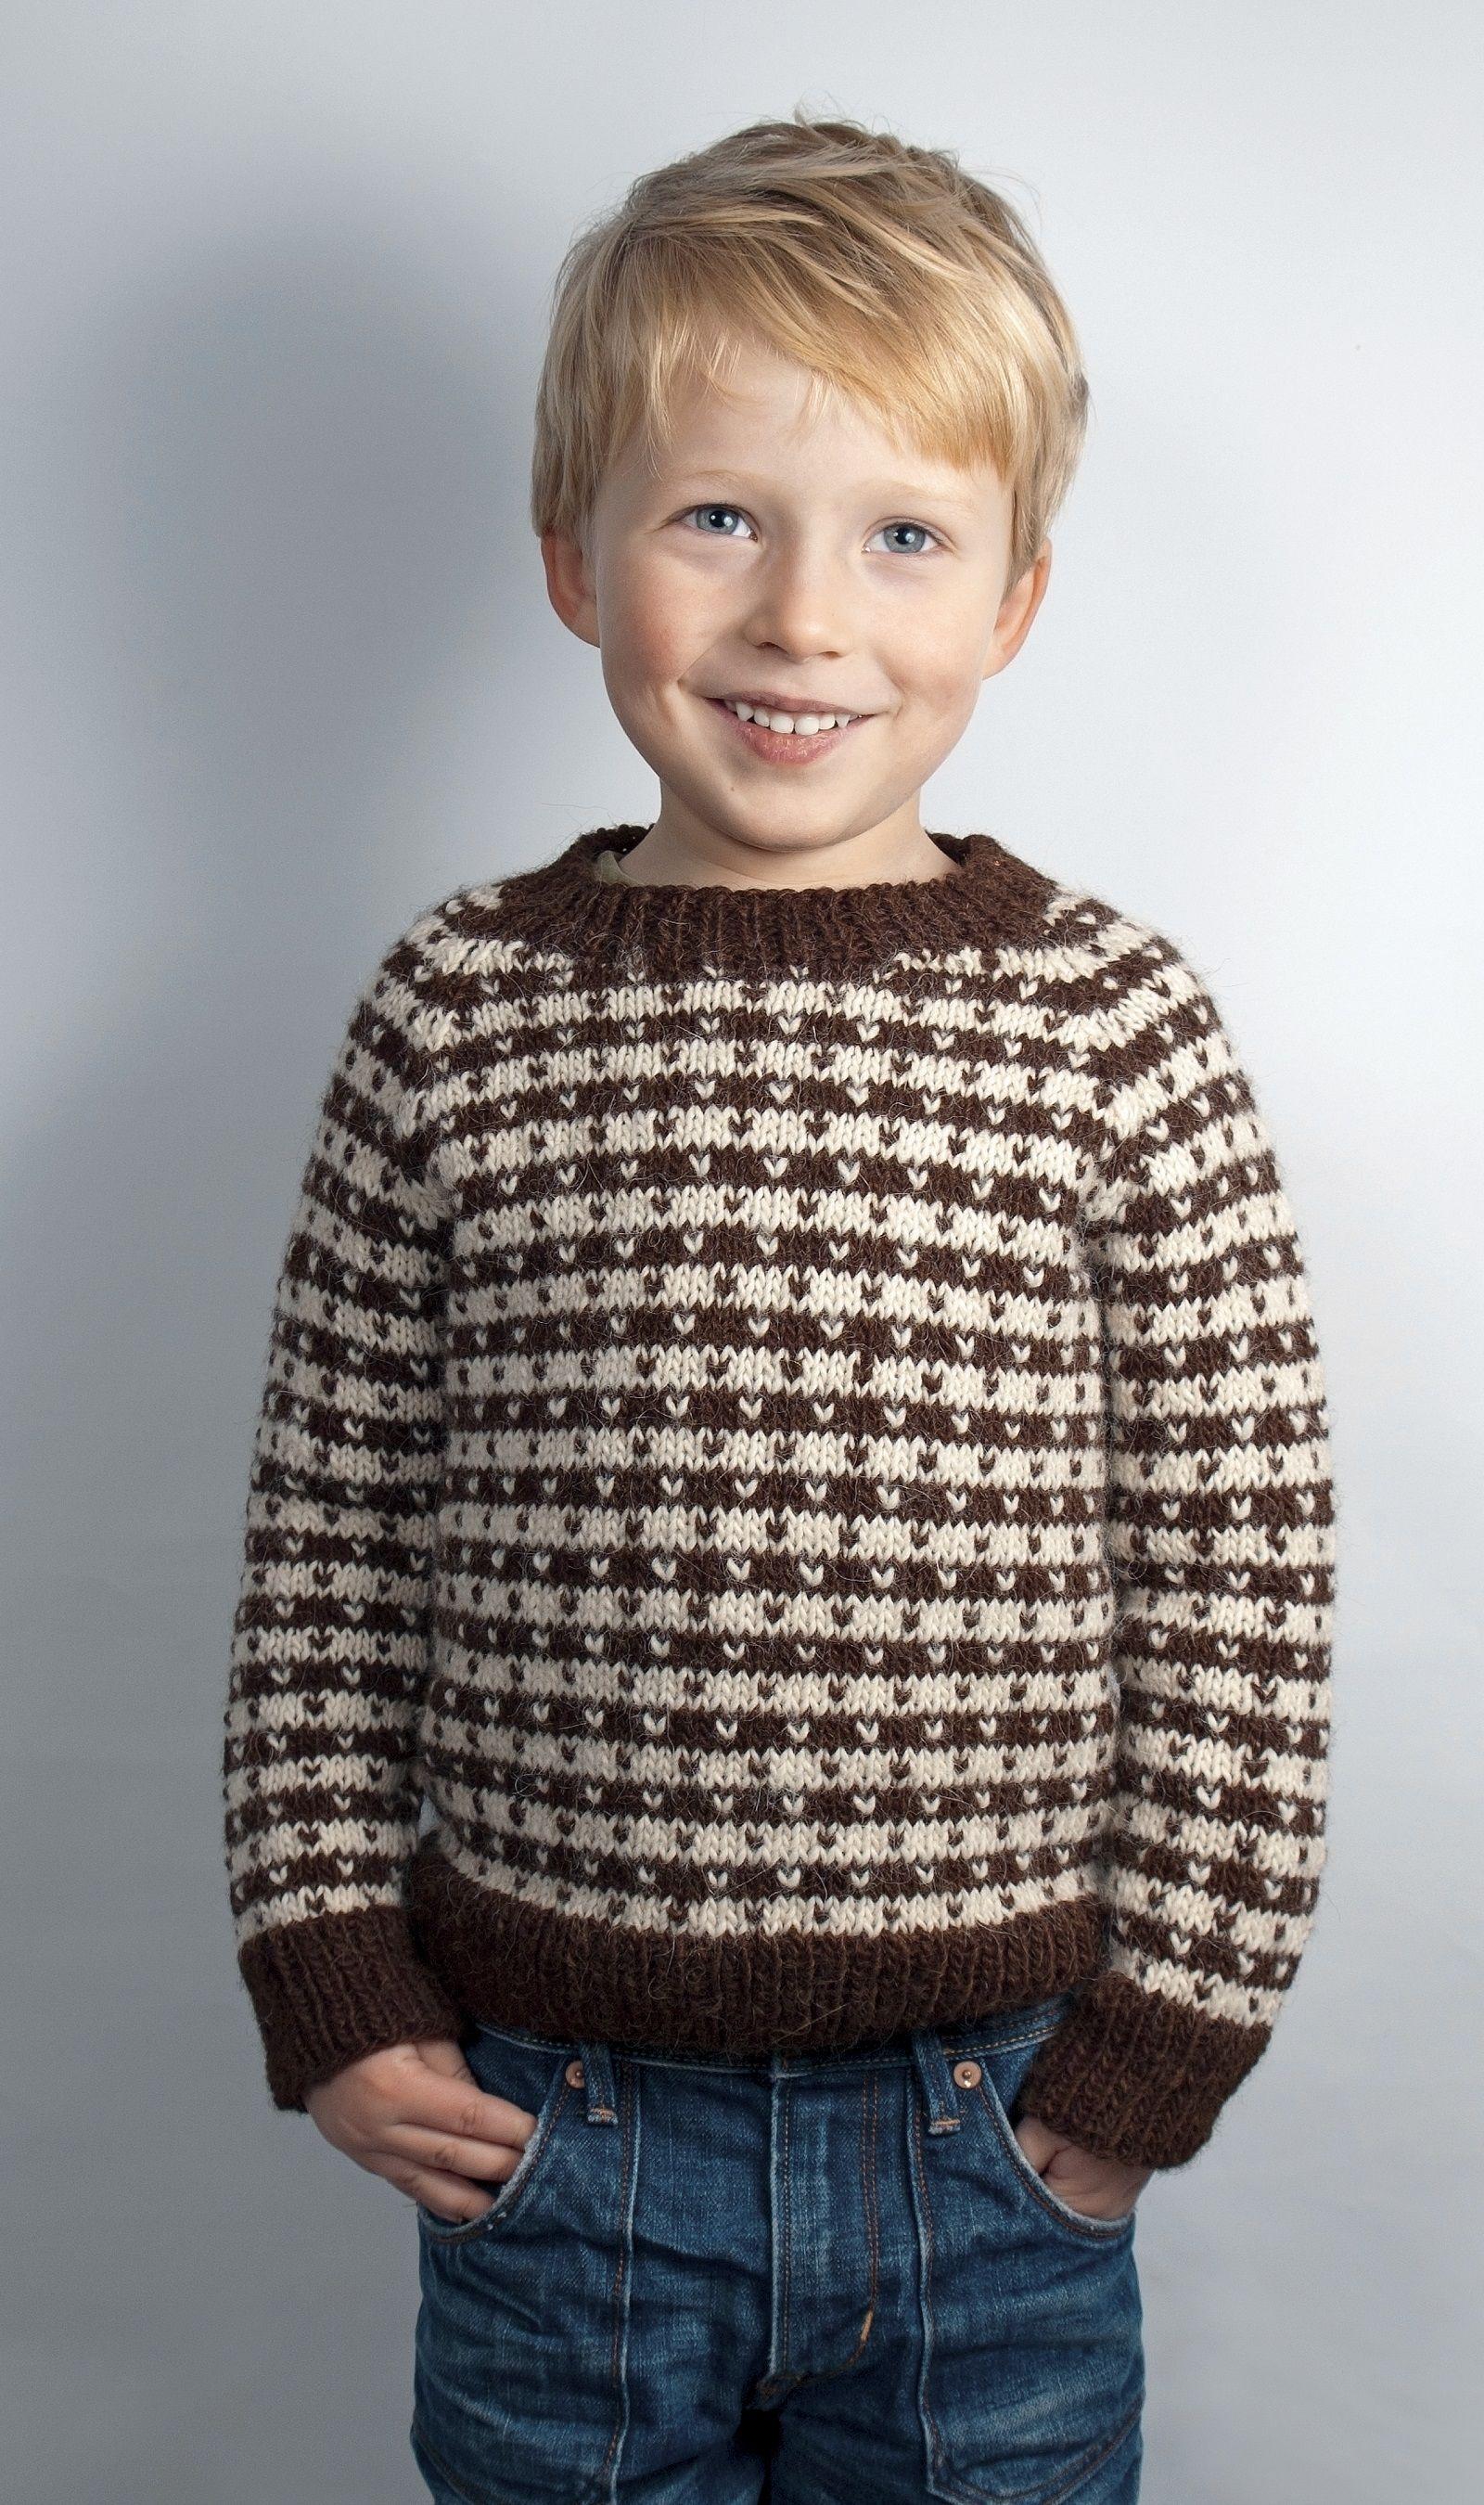 c1699b553f0b66 boys kids alpaca faroese sweater, photo from camarose knitting pattern,  fuzzy fluffy childs childrens nordic fair-isle